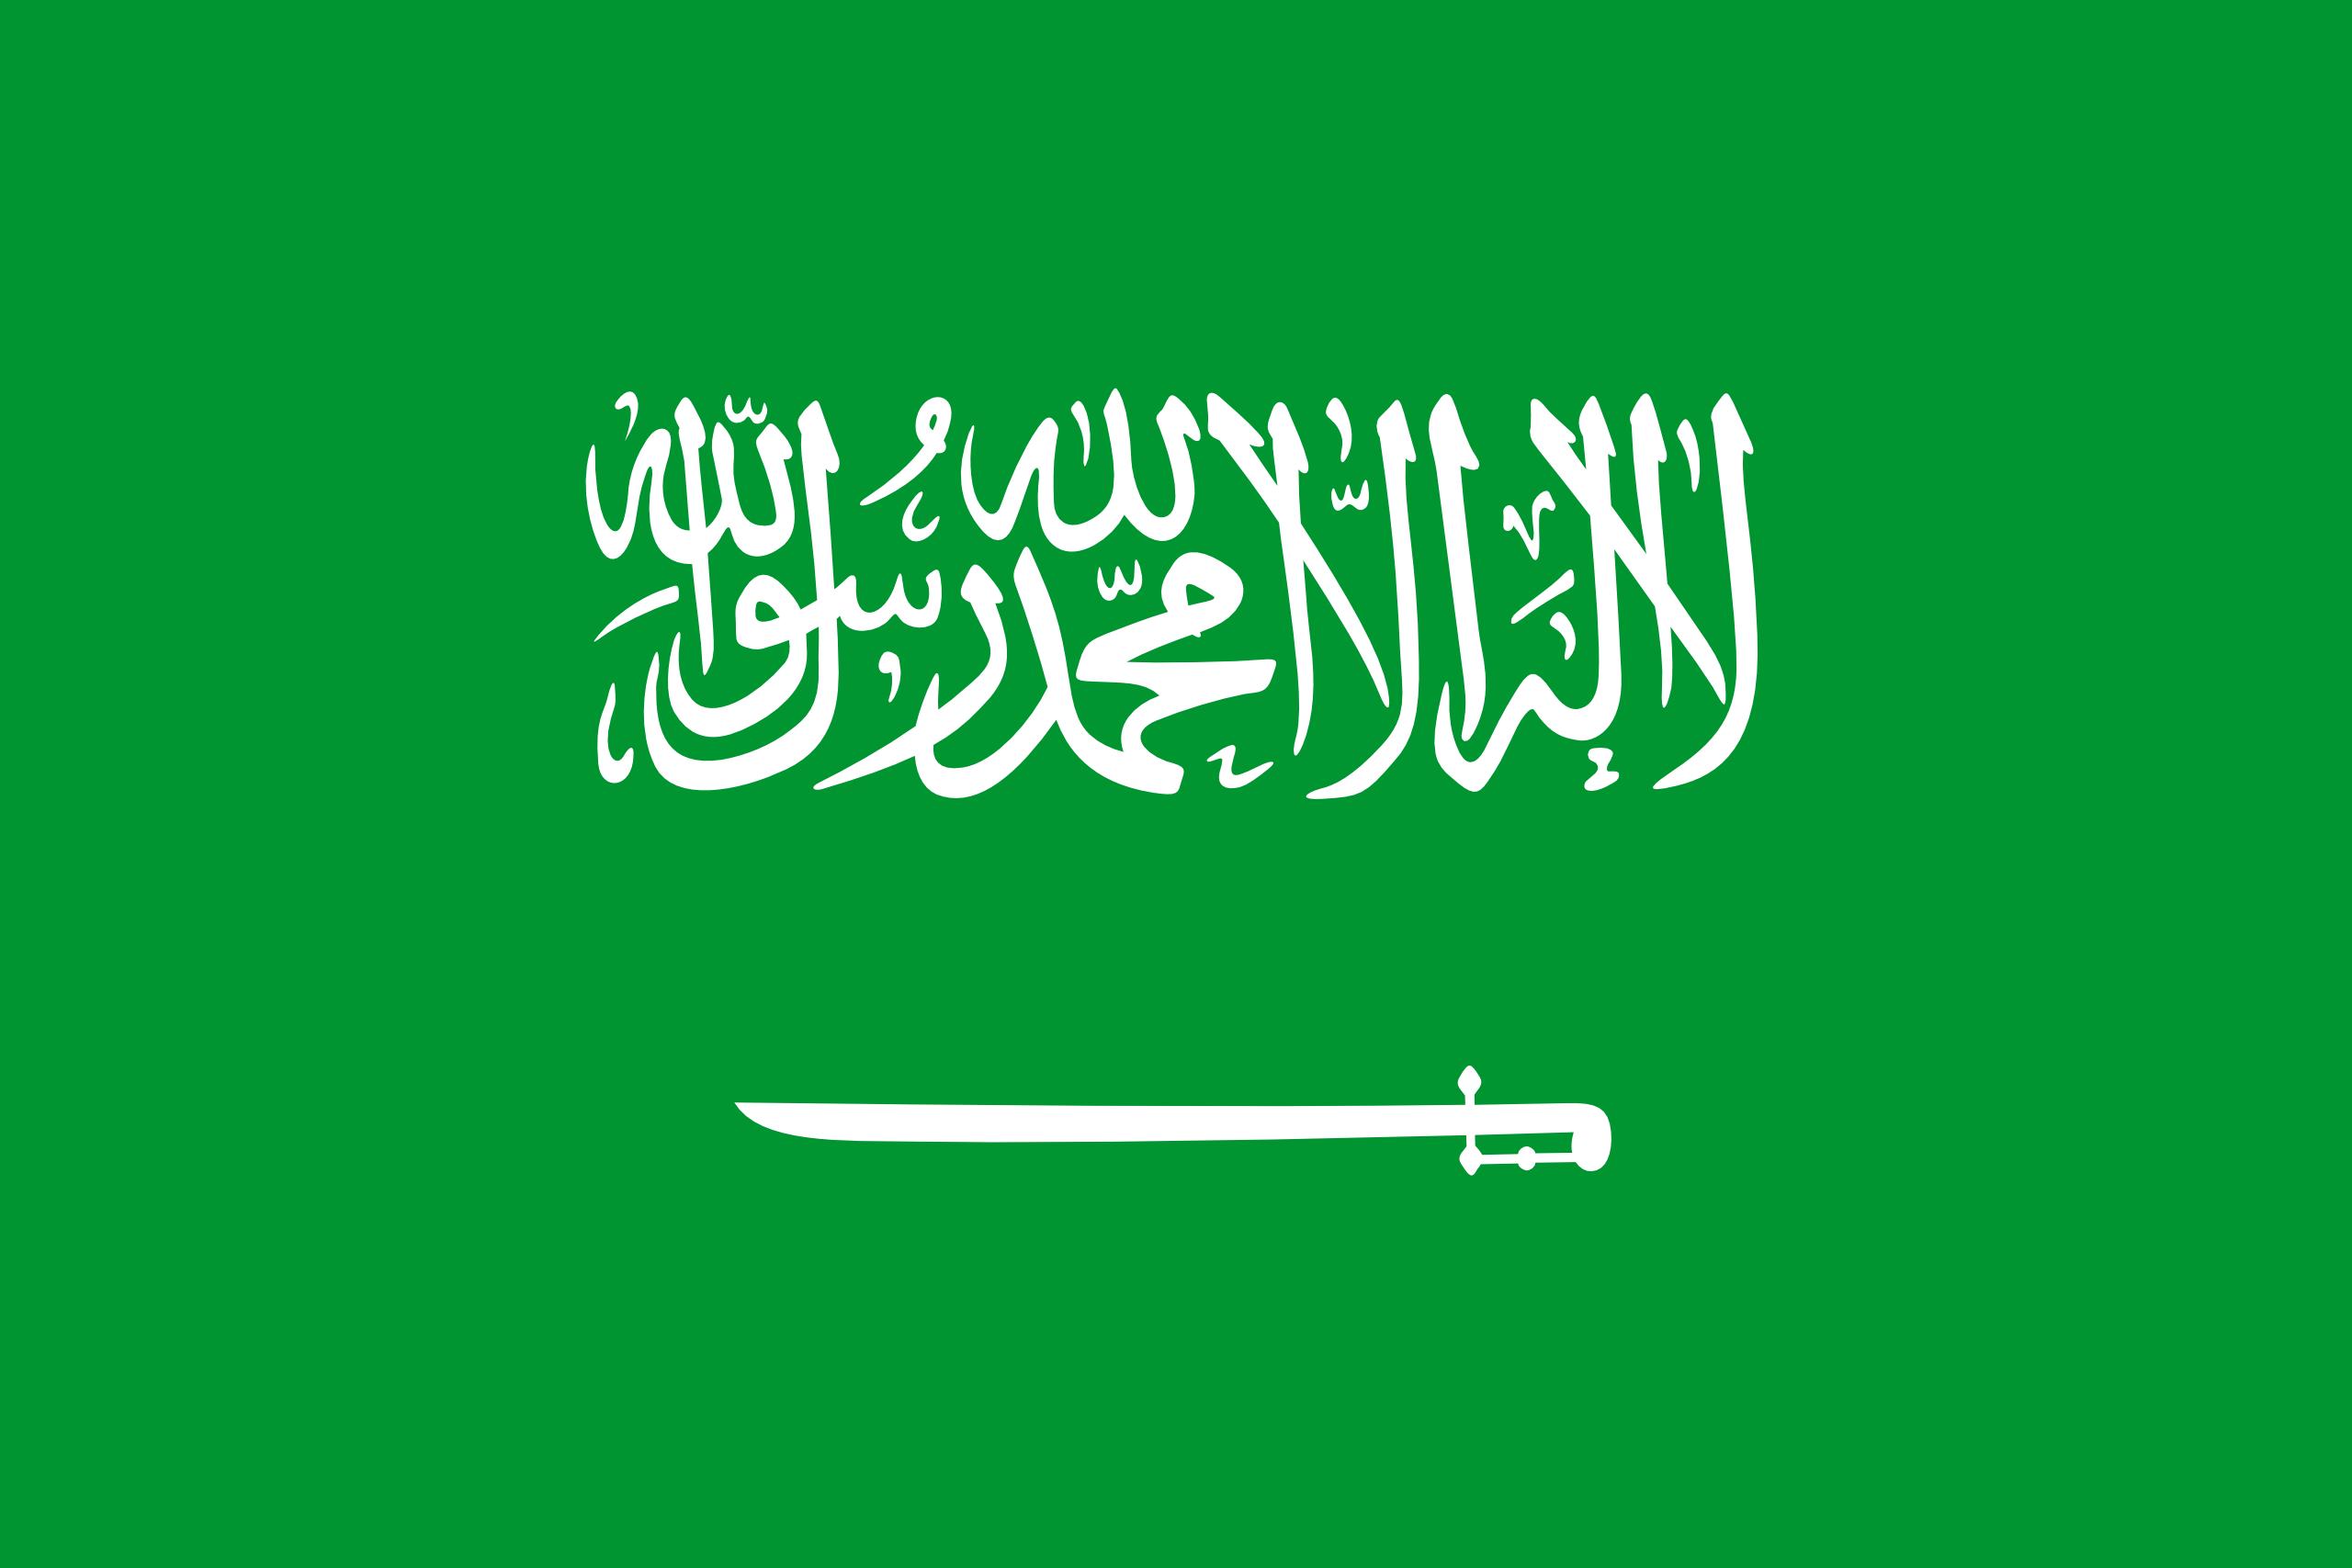 arabia saudita, χώρα, έμβλημα, λογότυπο, σύμβολο - Wallpapers HD - Professor-falken.com